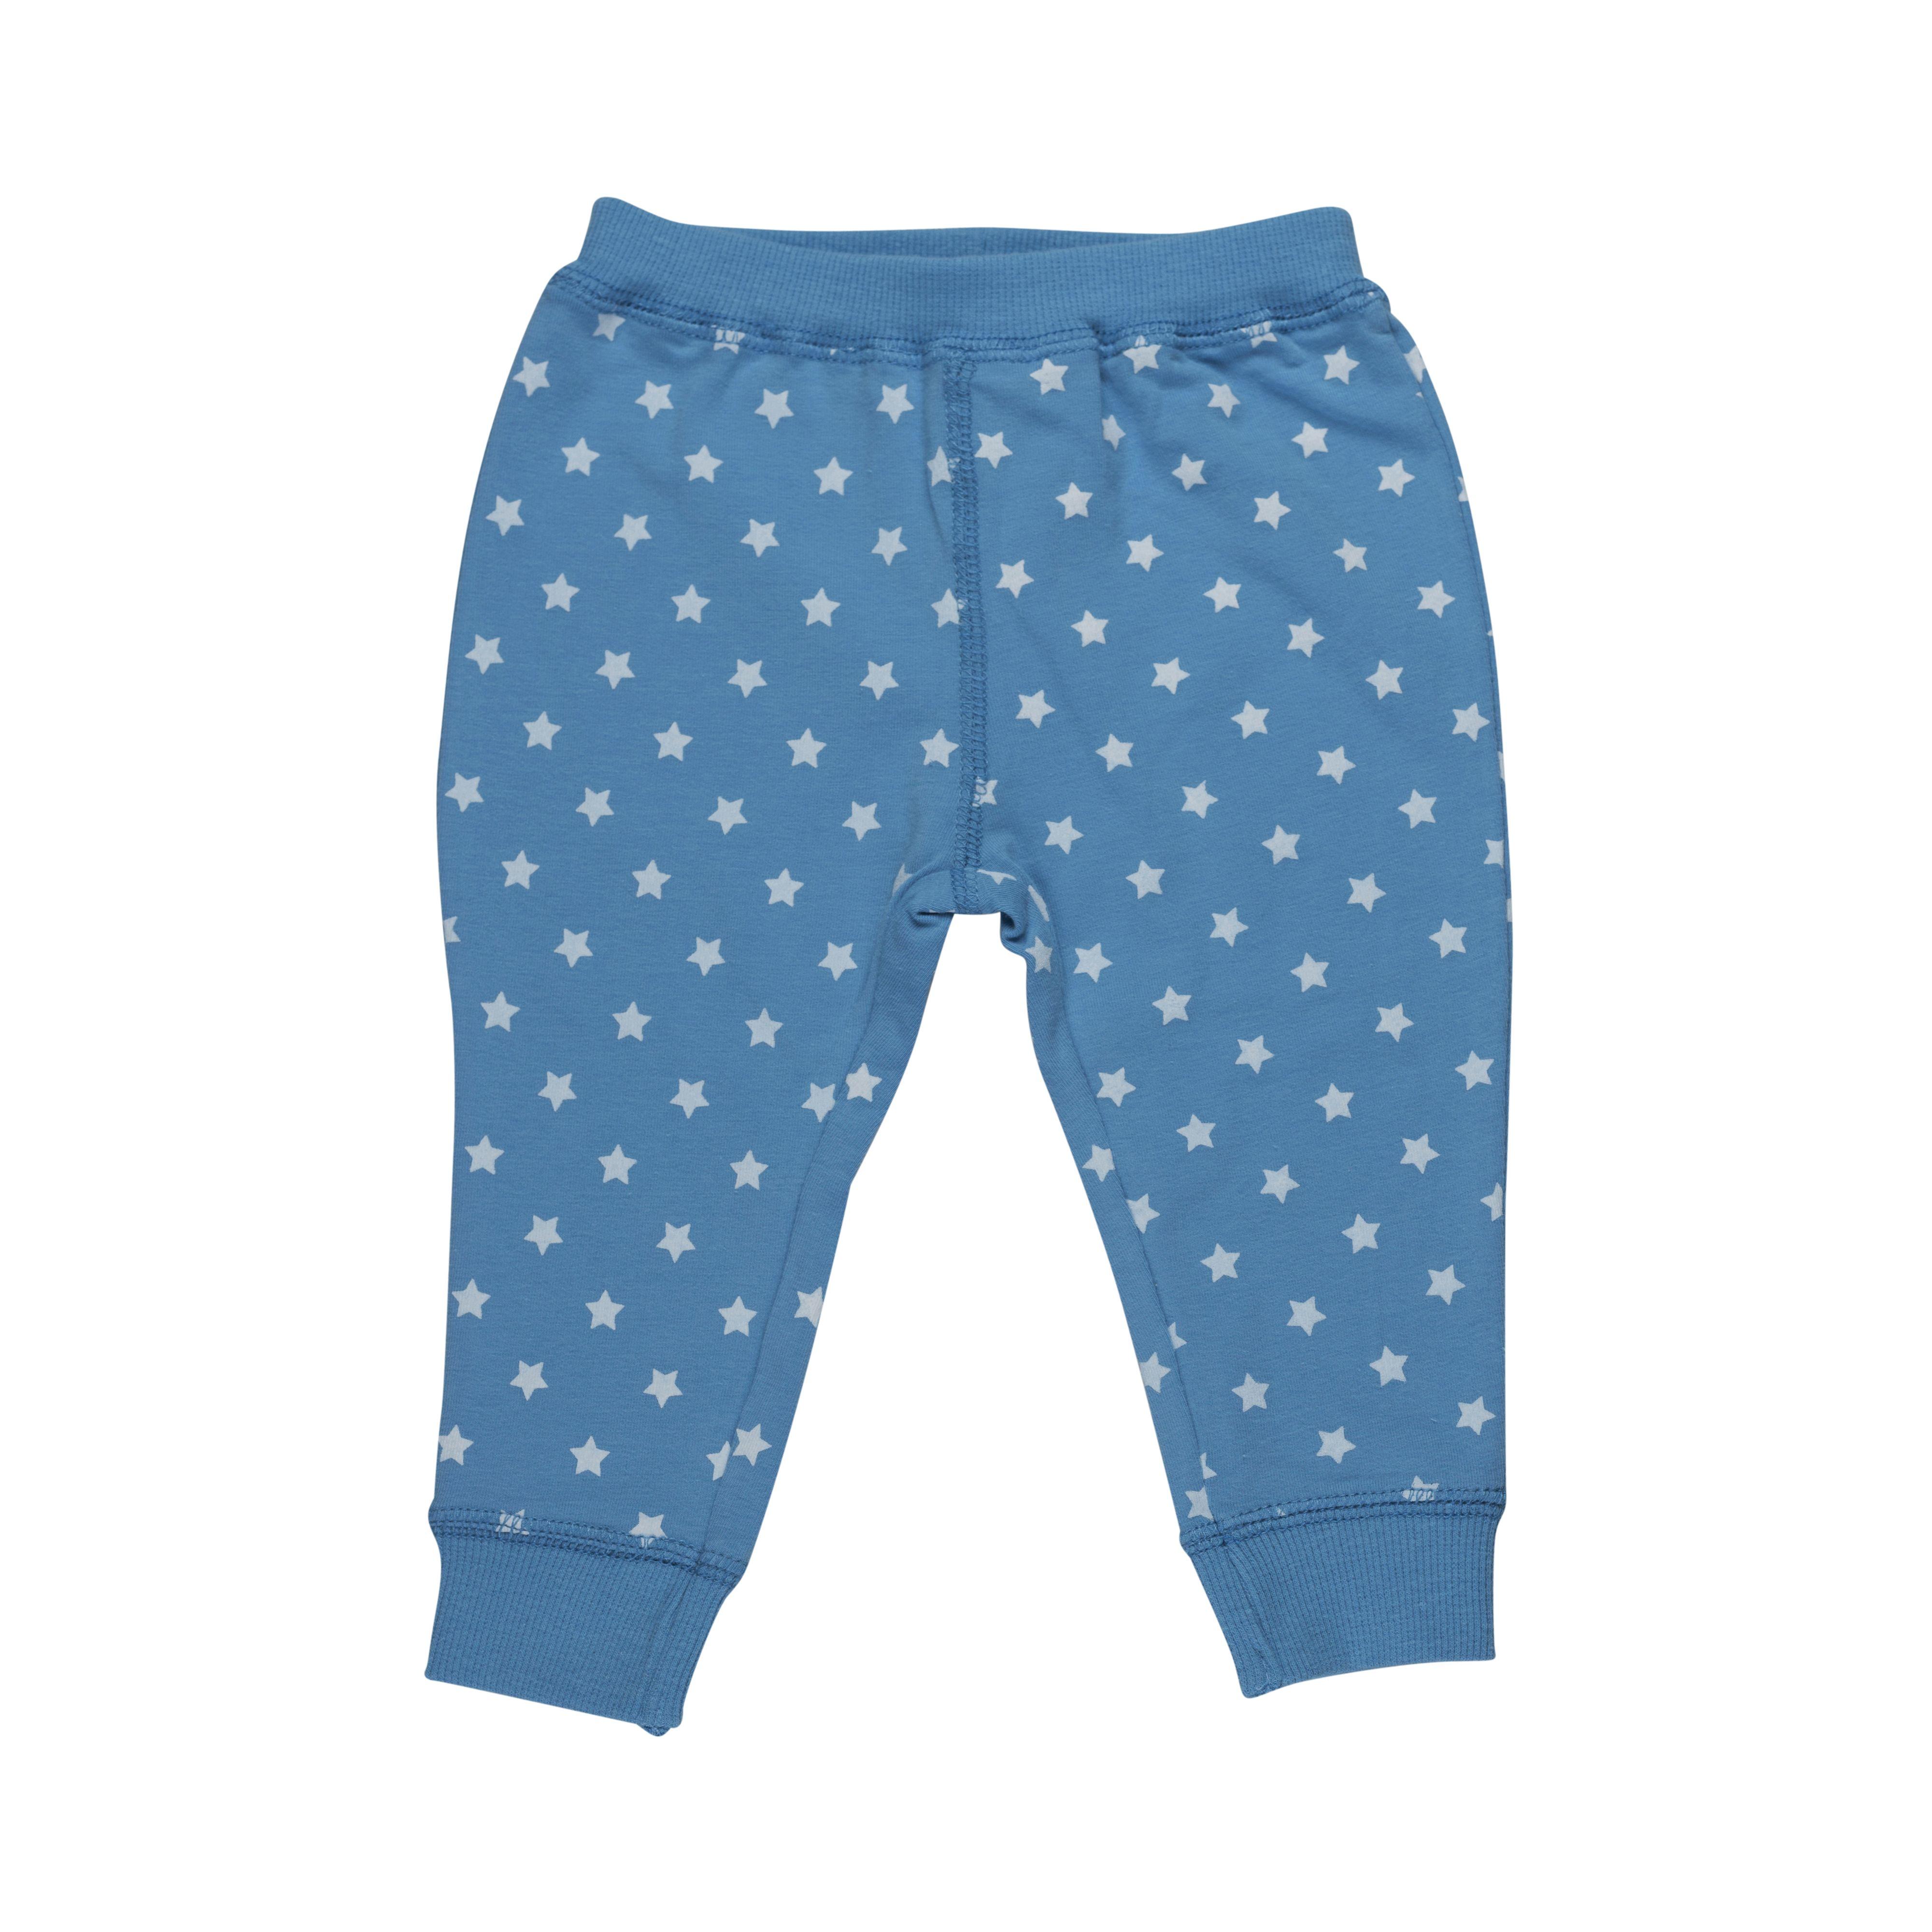 346aacc9adf Baby bukser fra Pippi – Økologisk Bomuld – Blue & Stars